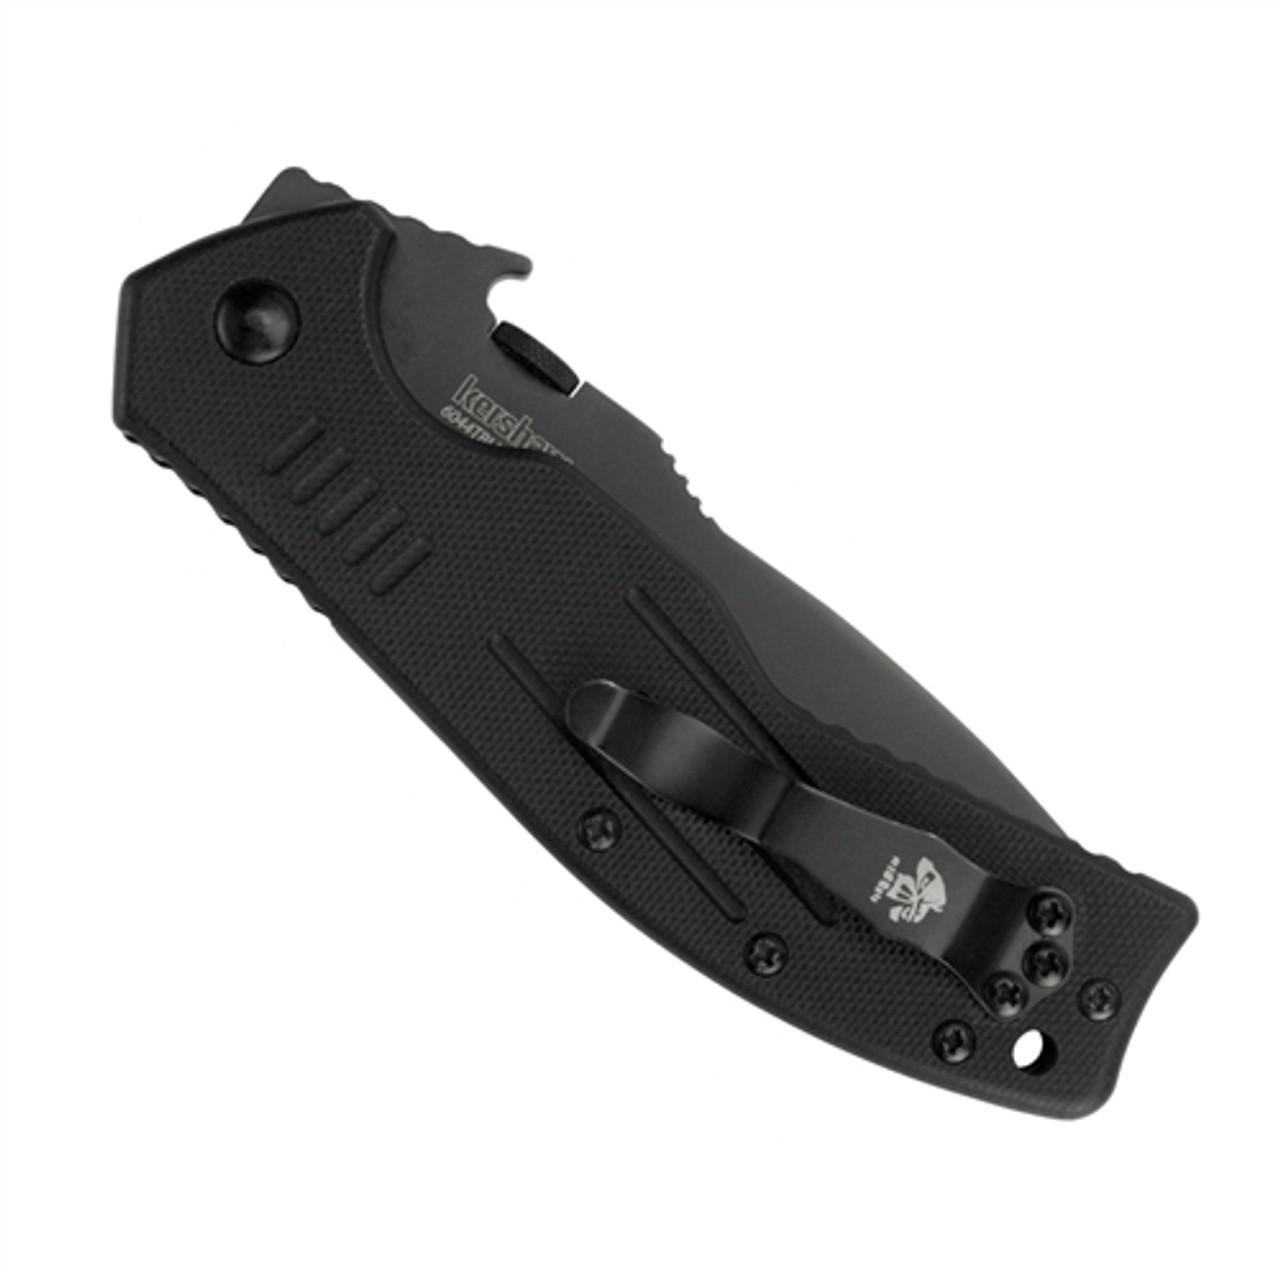 Kershaw Emerson CQC-8K Knife, Black Tanto Point Blade